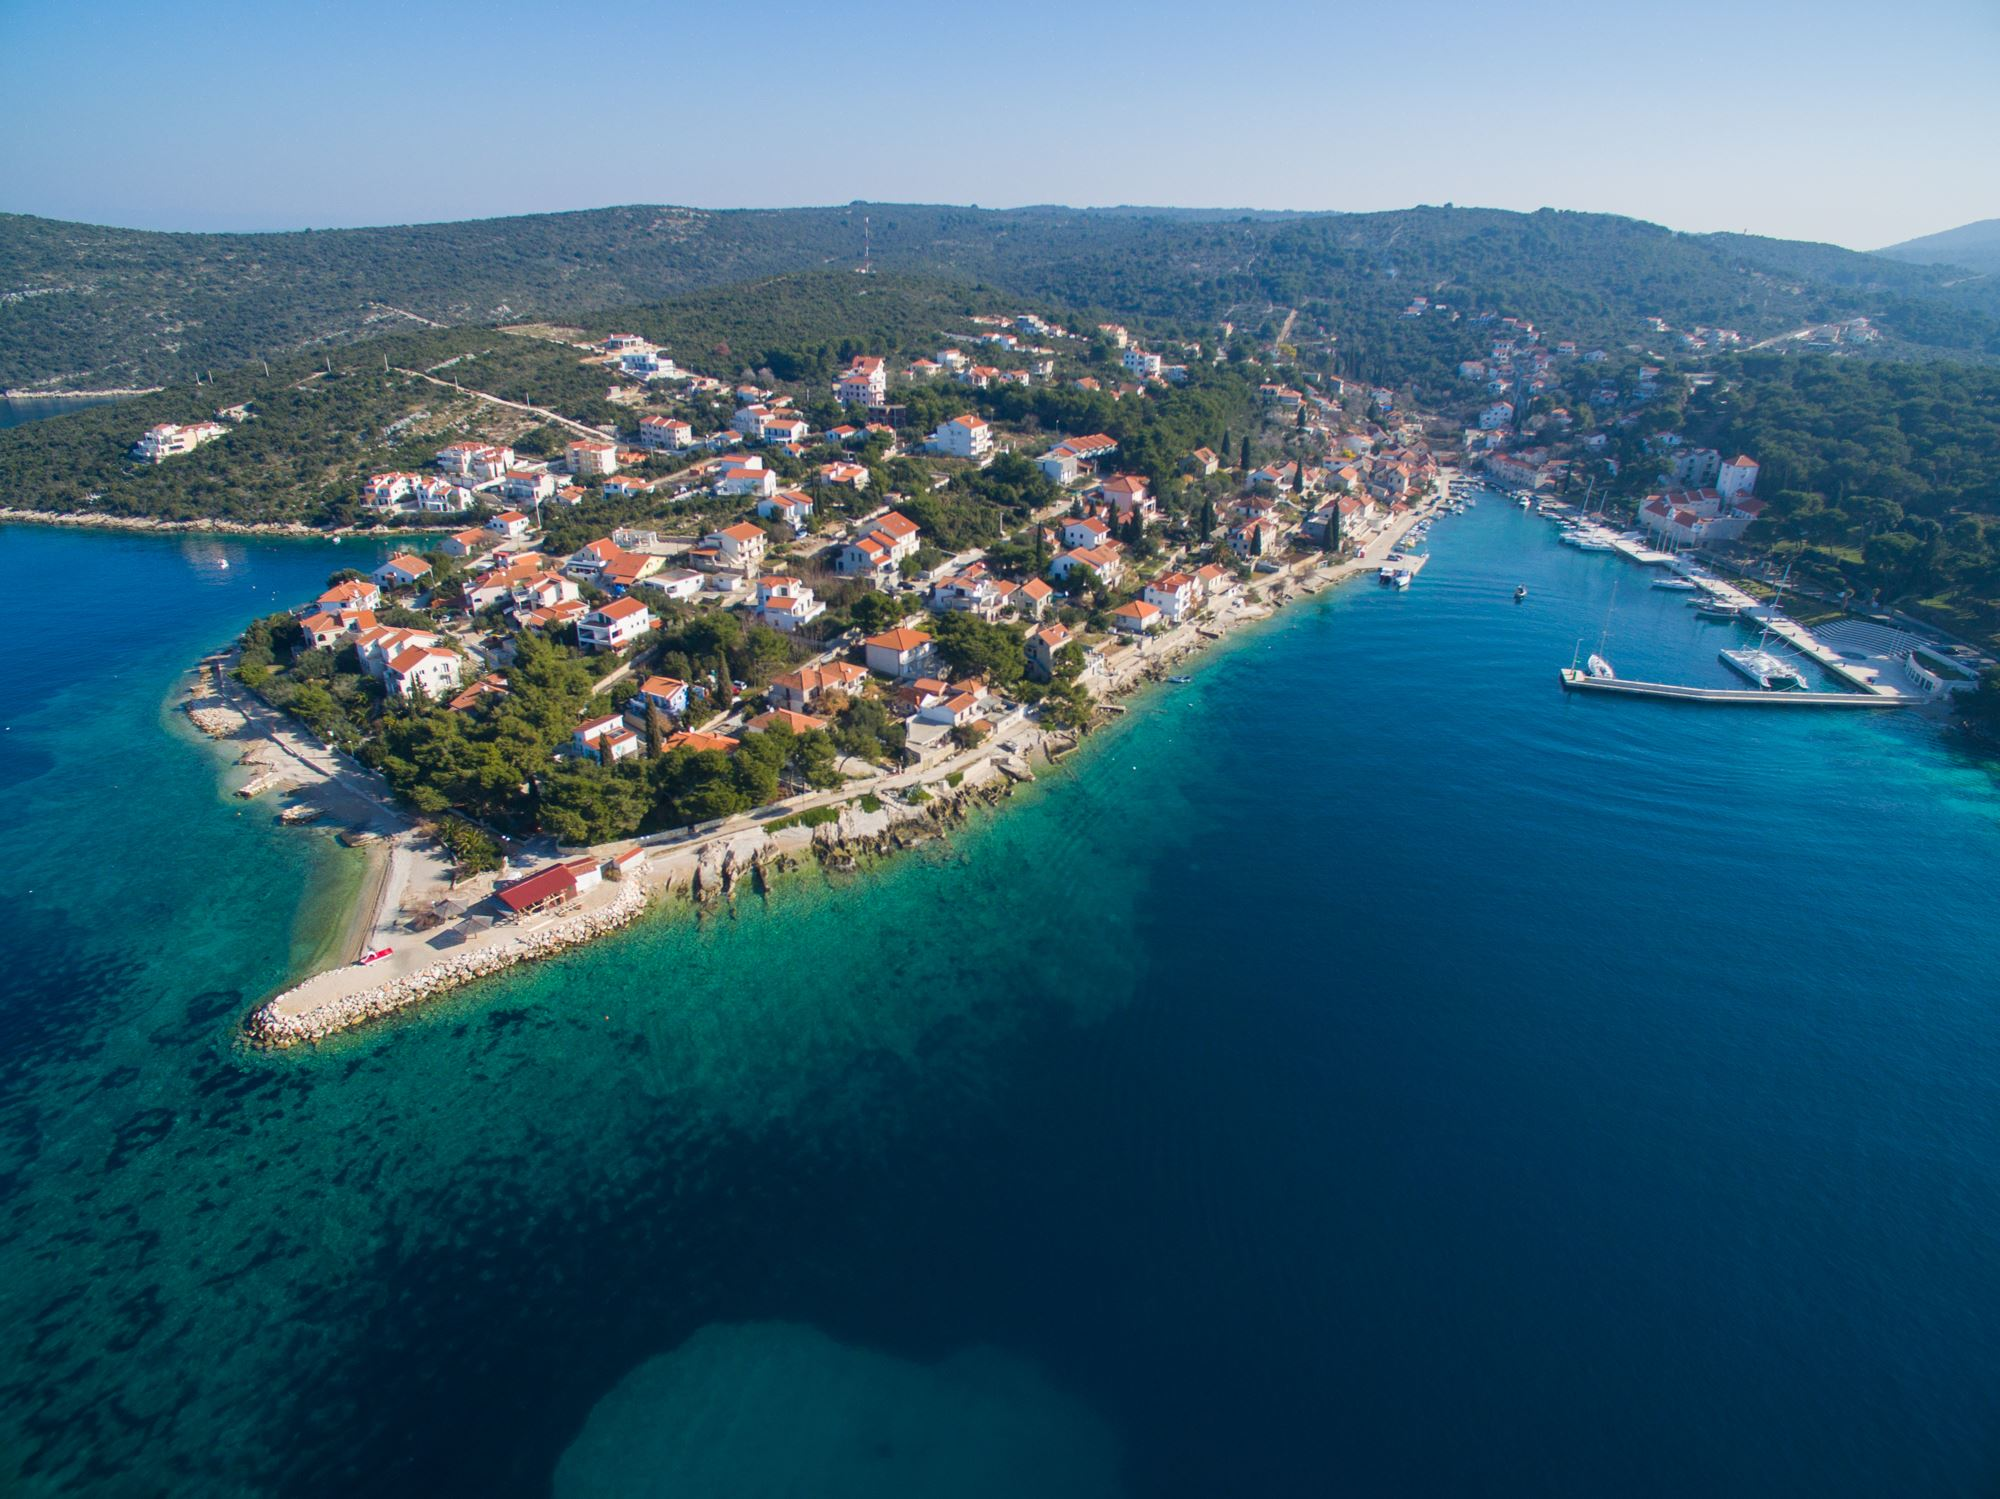 Šolta Island (Solta Island), Croatia - Monterrasol private tours to Šolta Island (Solta Island), Croatia. Travel agency offers custom private car tours to see Šolta Island (Solta Island) in Croatia. Order custom private tour to Šolta Island (Solta Island) with departure date on request.